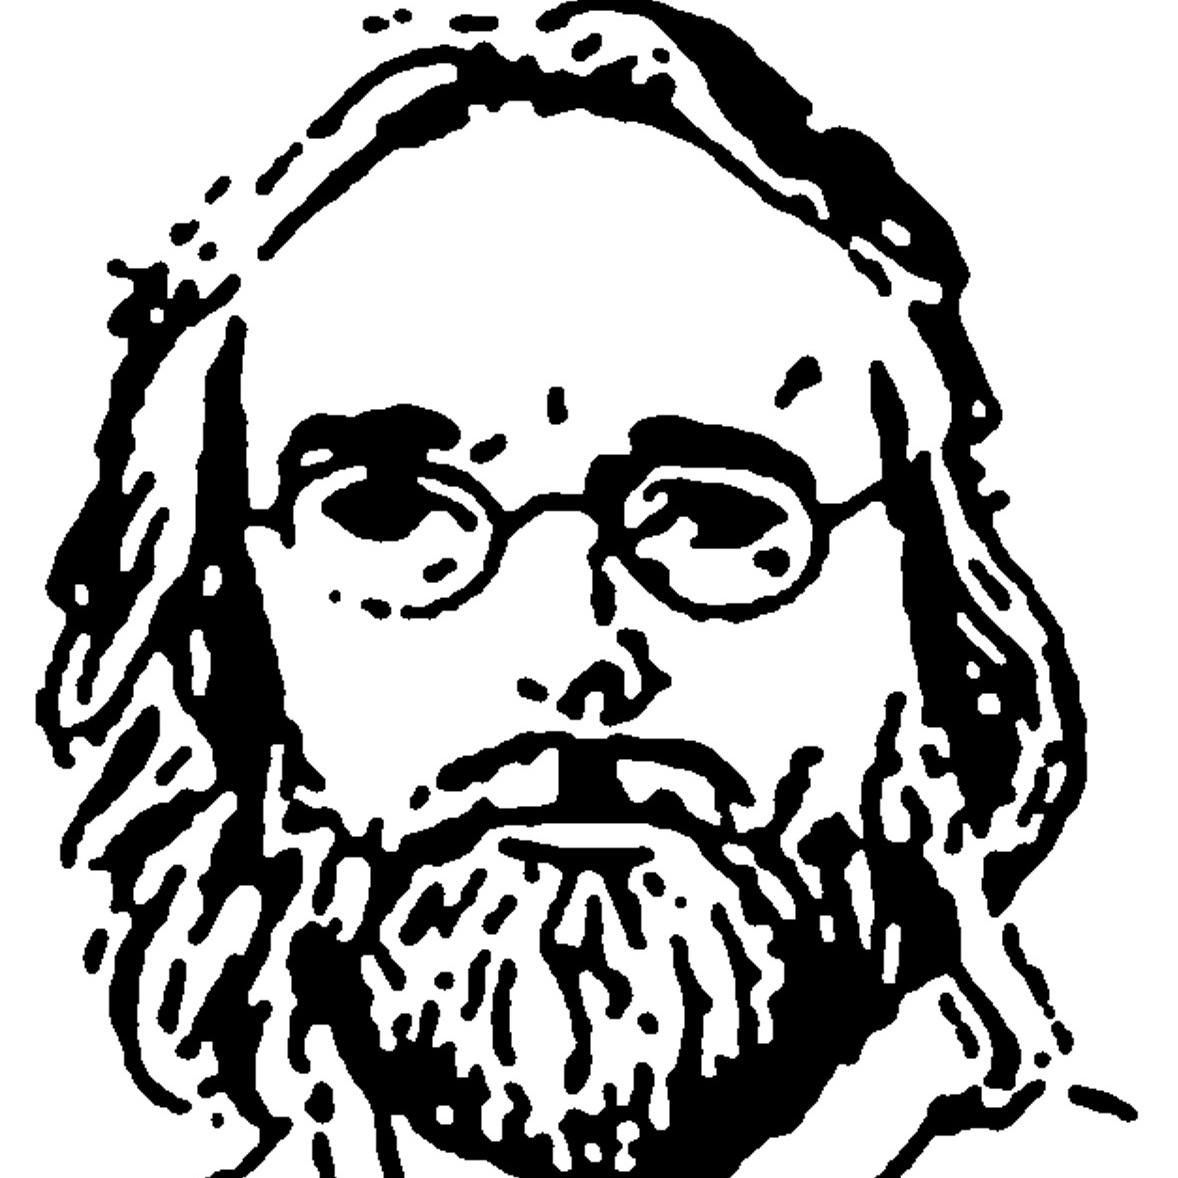 Uli Grohmann